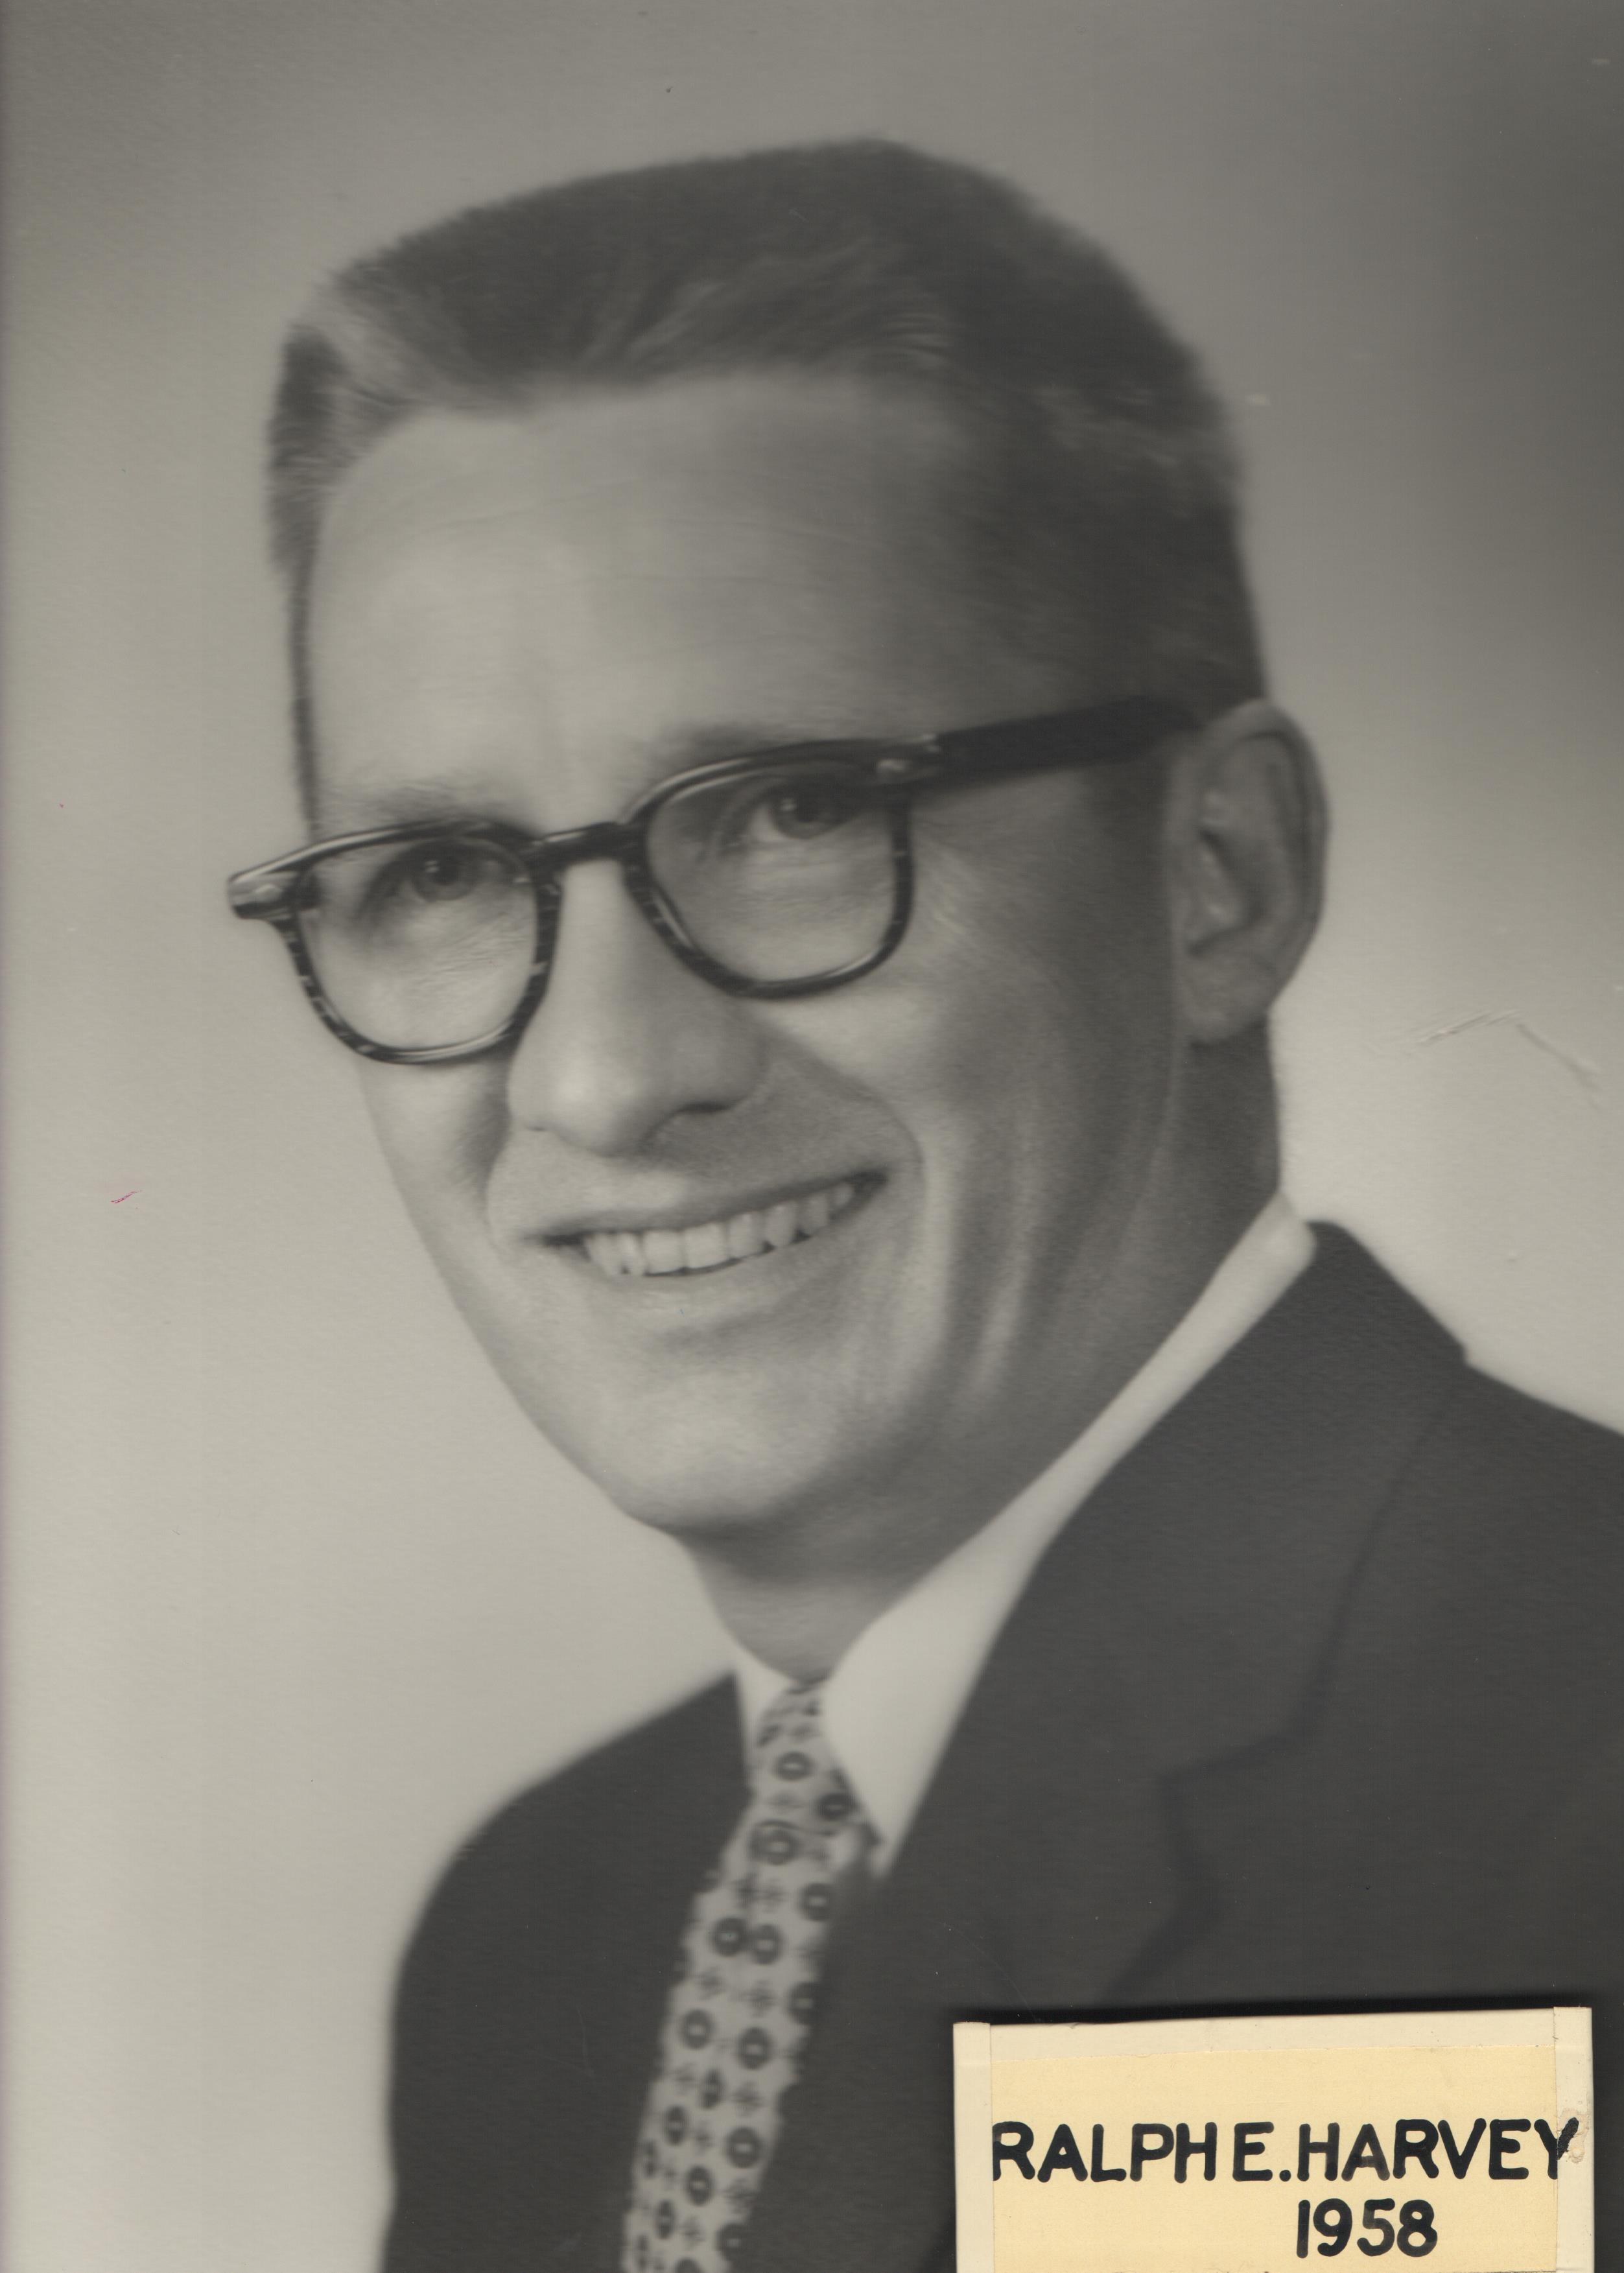 1958 Ralph E. Harvey